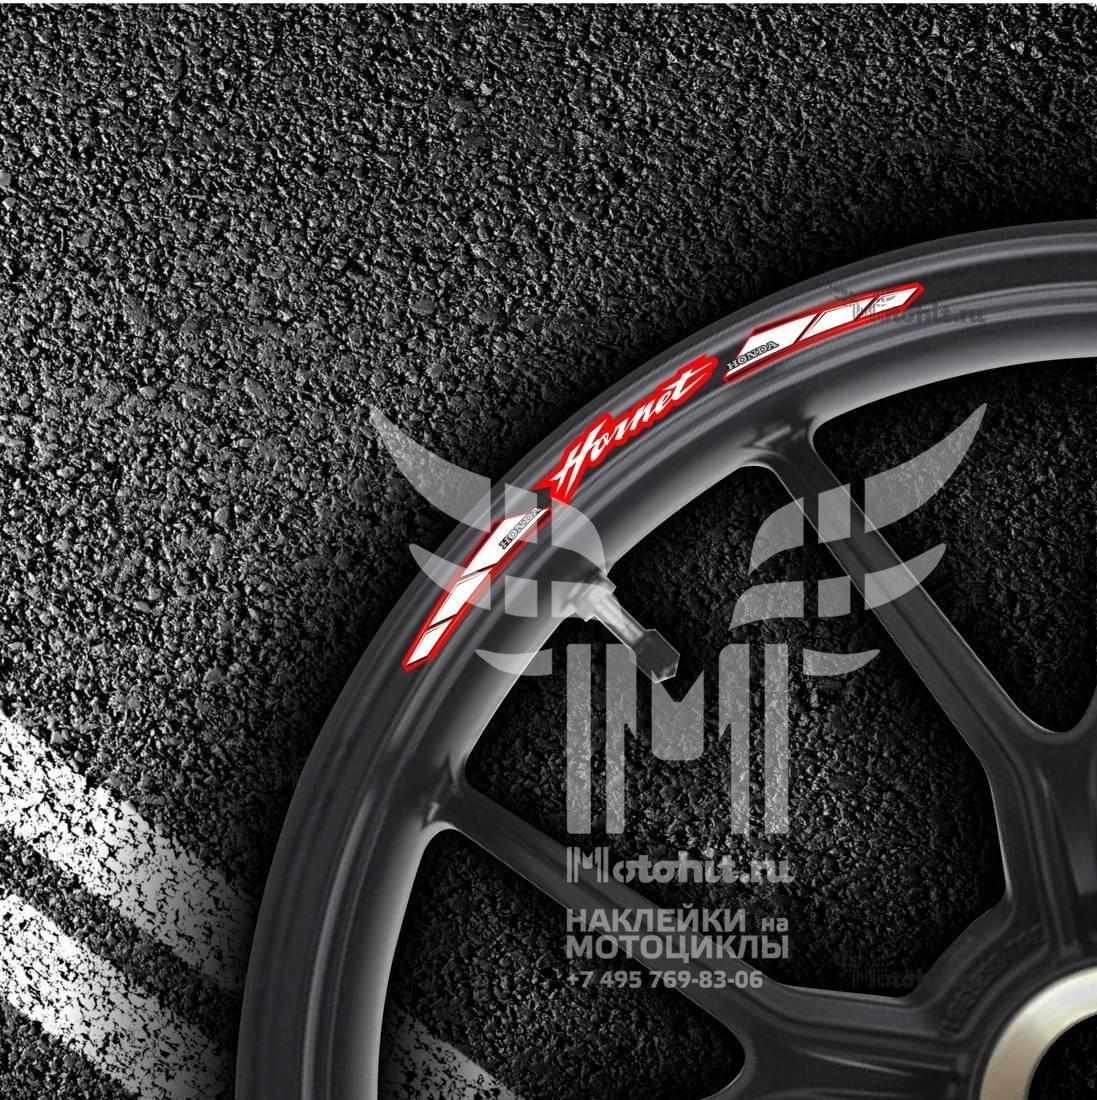 Комплект наклеек на обод колеса мотоцикла HONDA HORNET